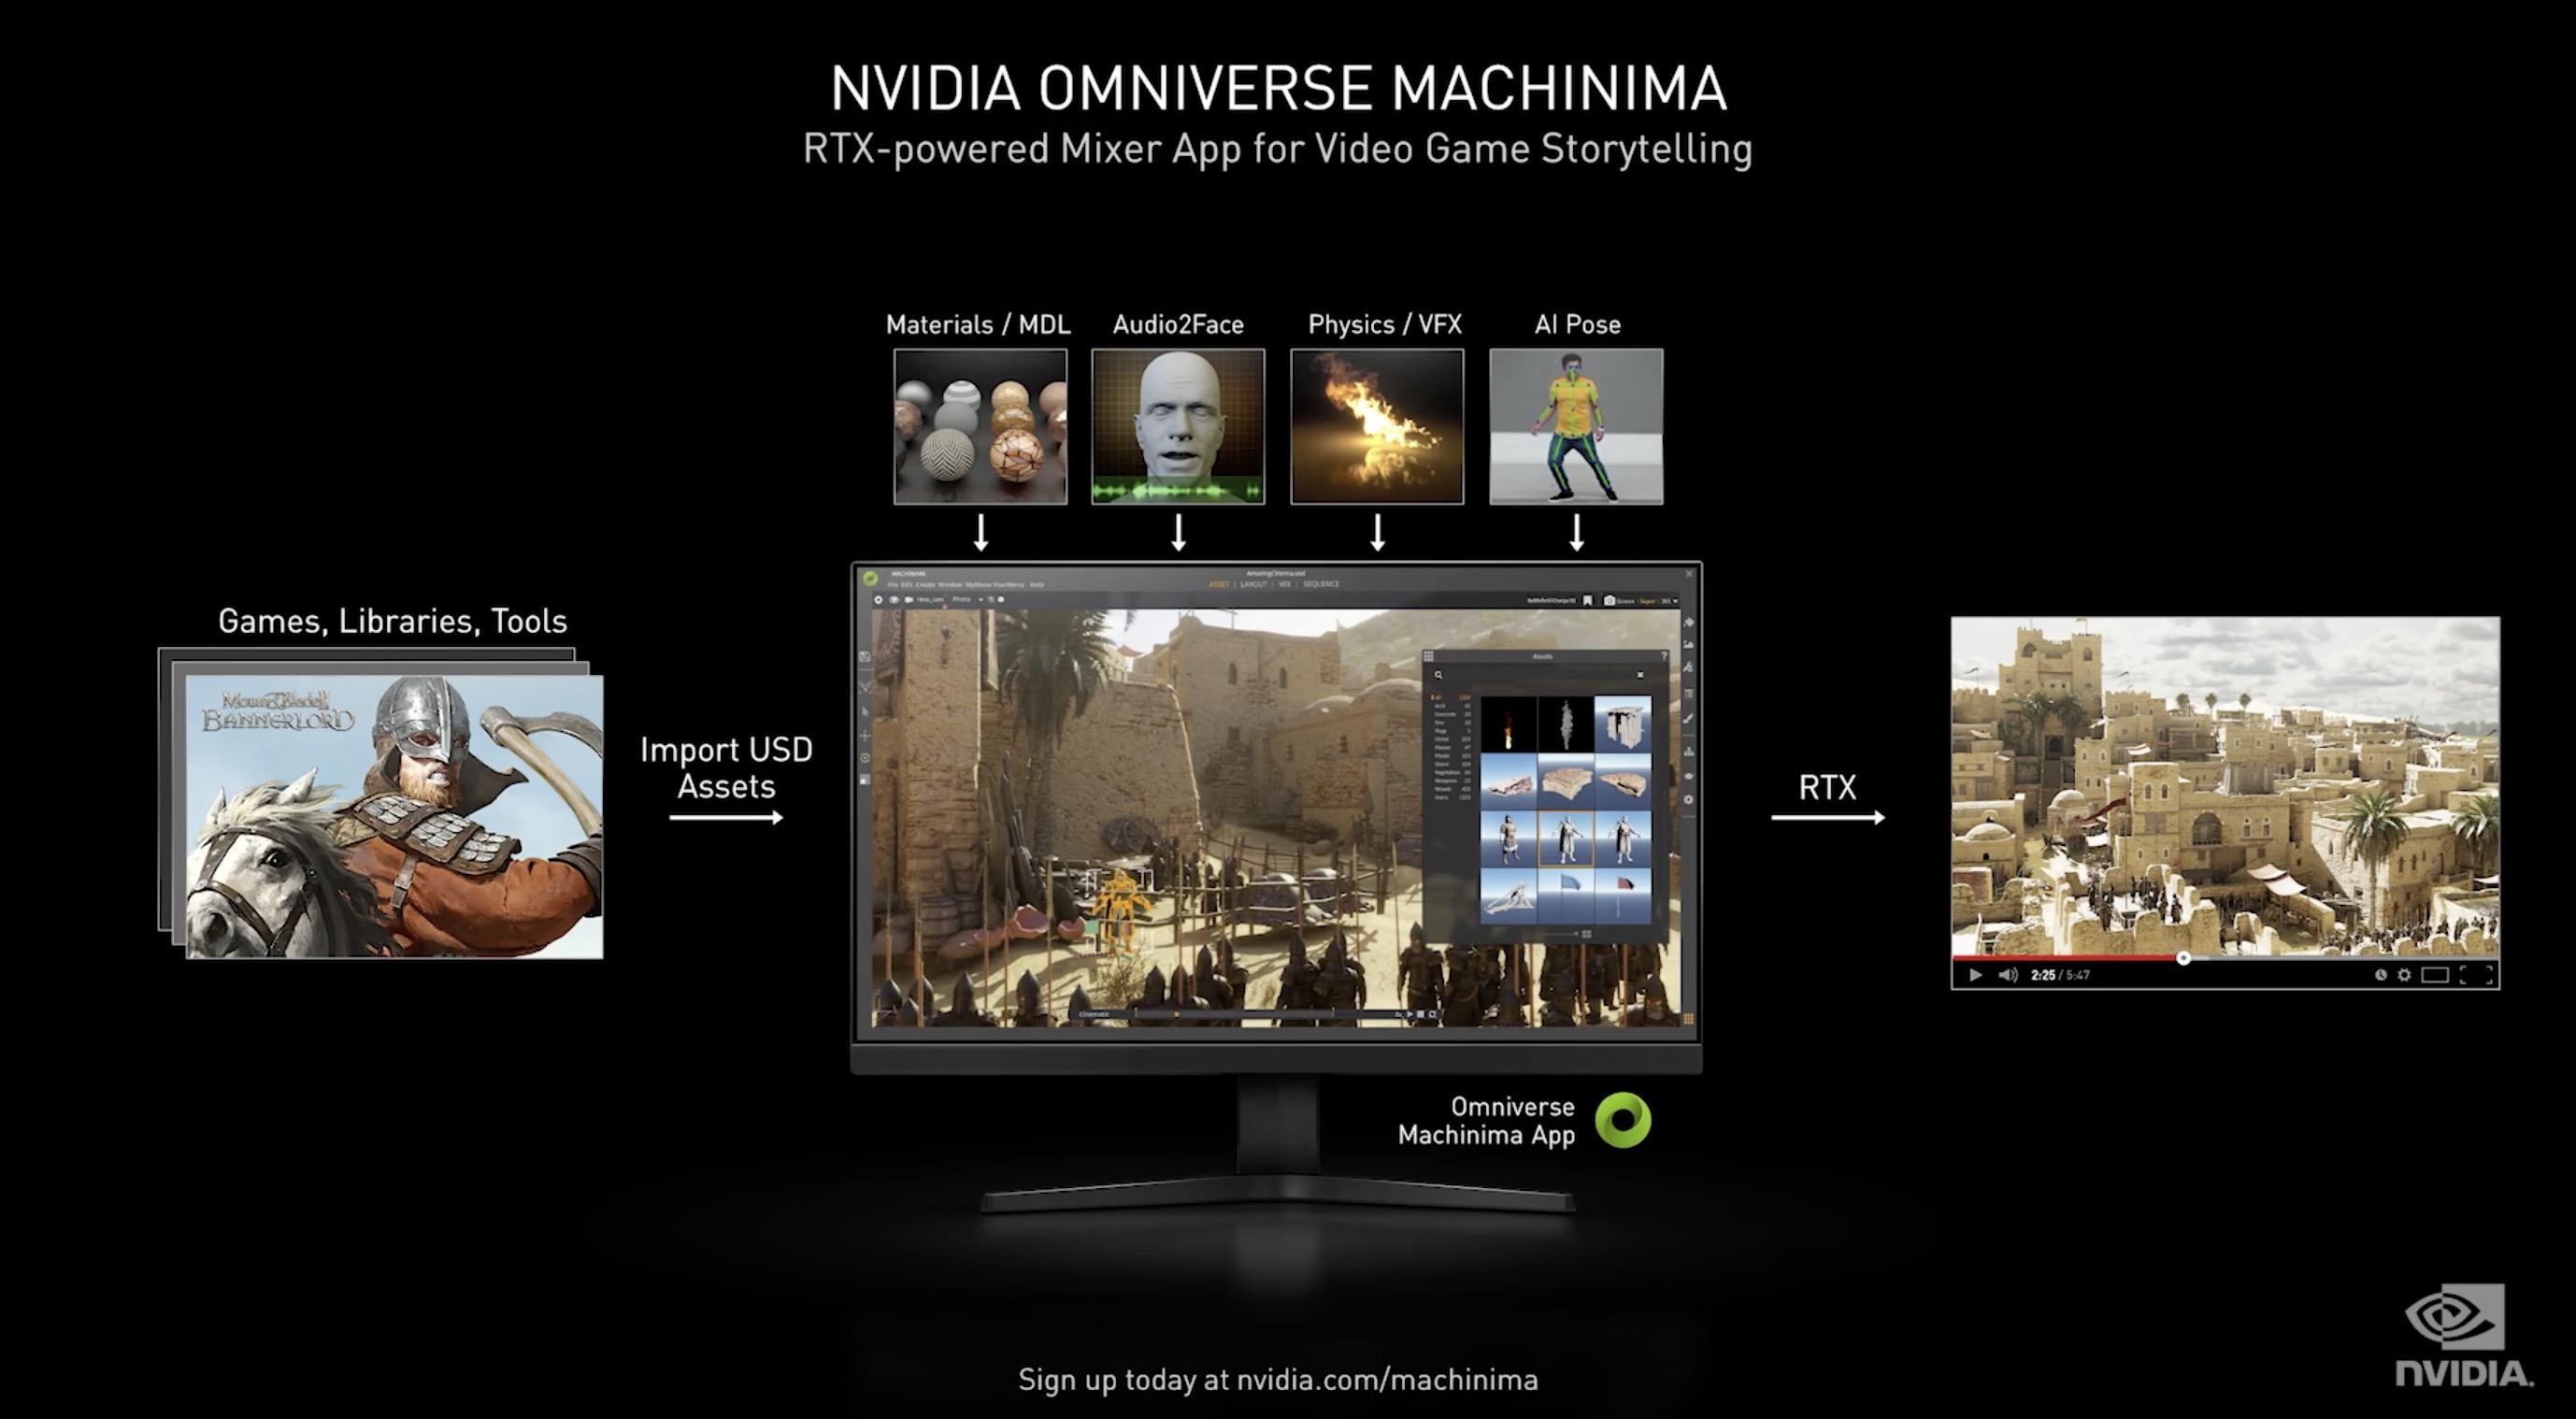 Nvidia Omniverse Machinima